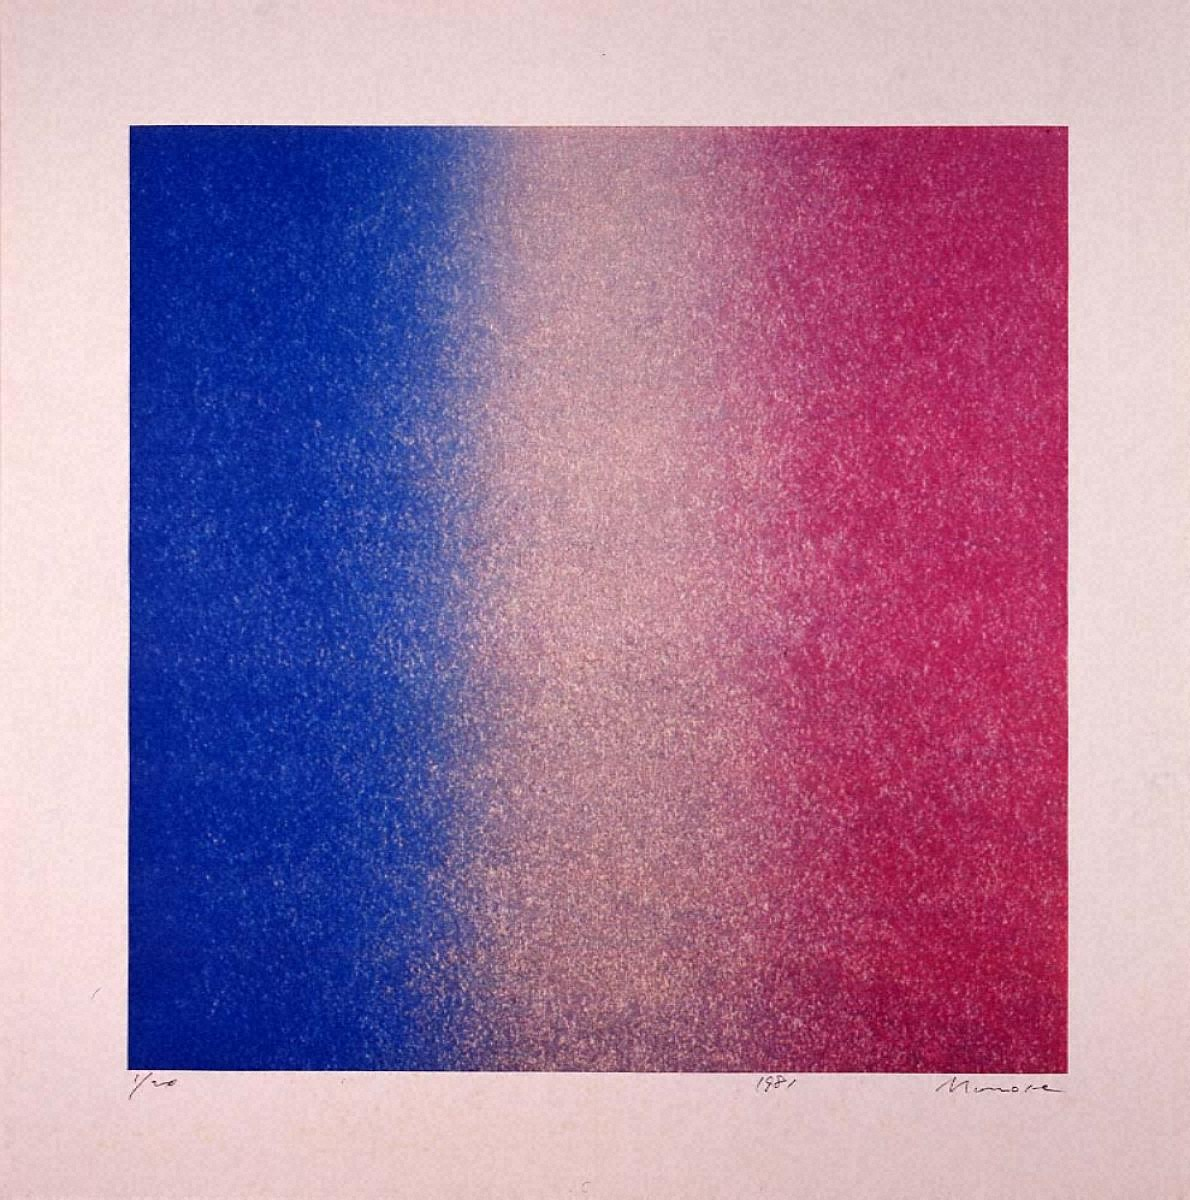 Square-Vertical Blue to Magenta